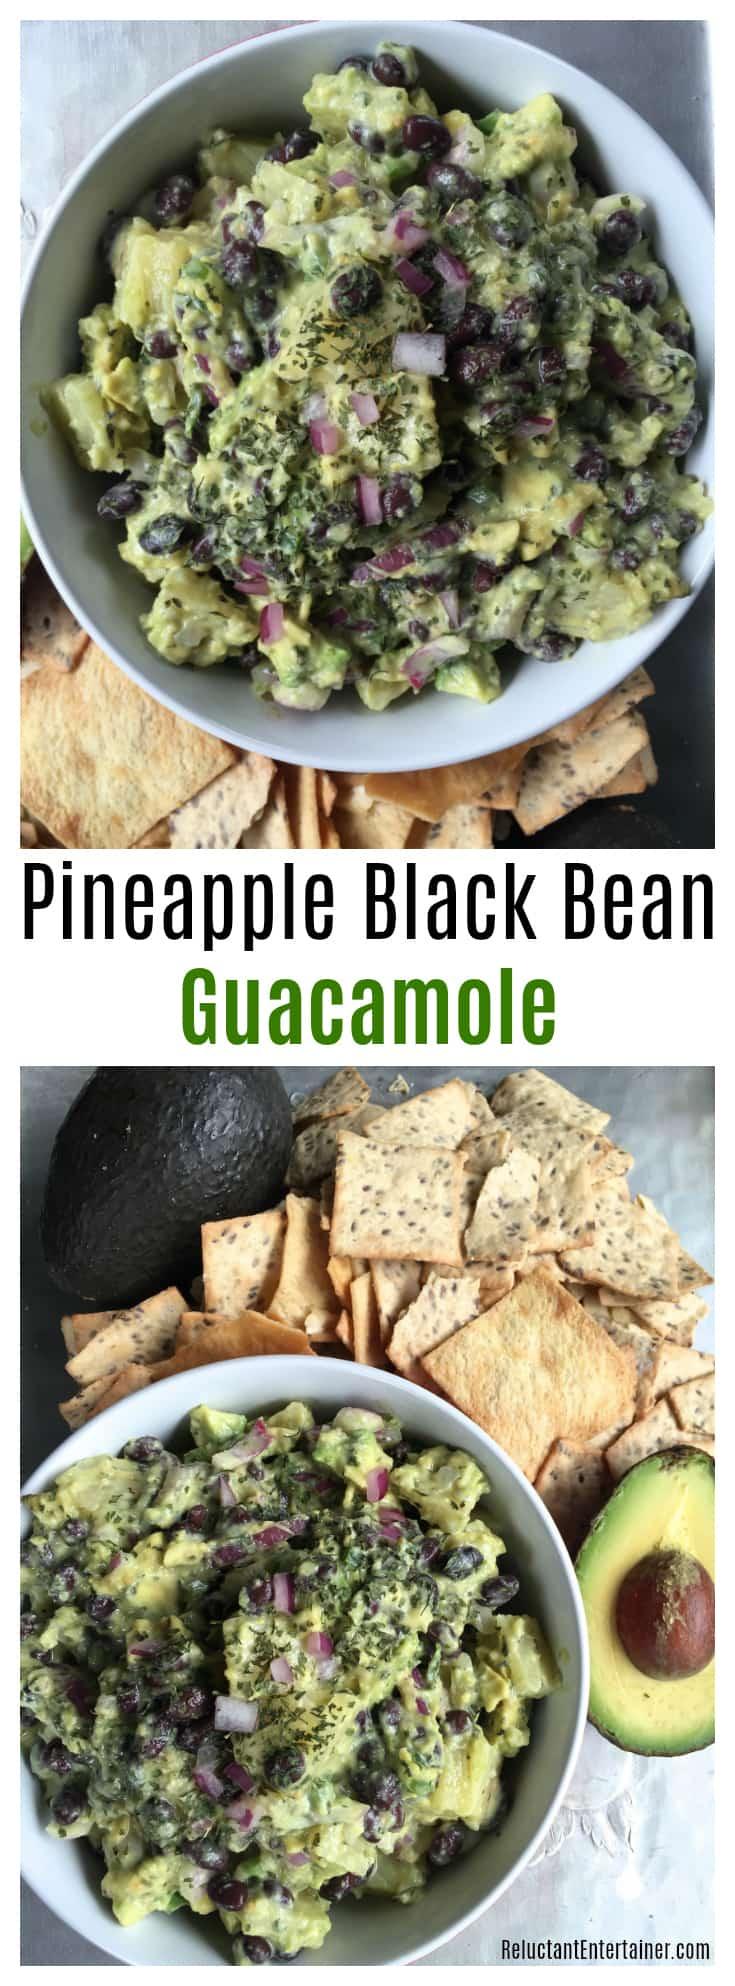 Pineapple Black Bean Guacamole